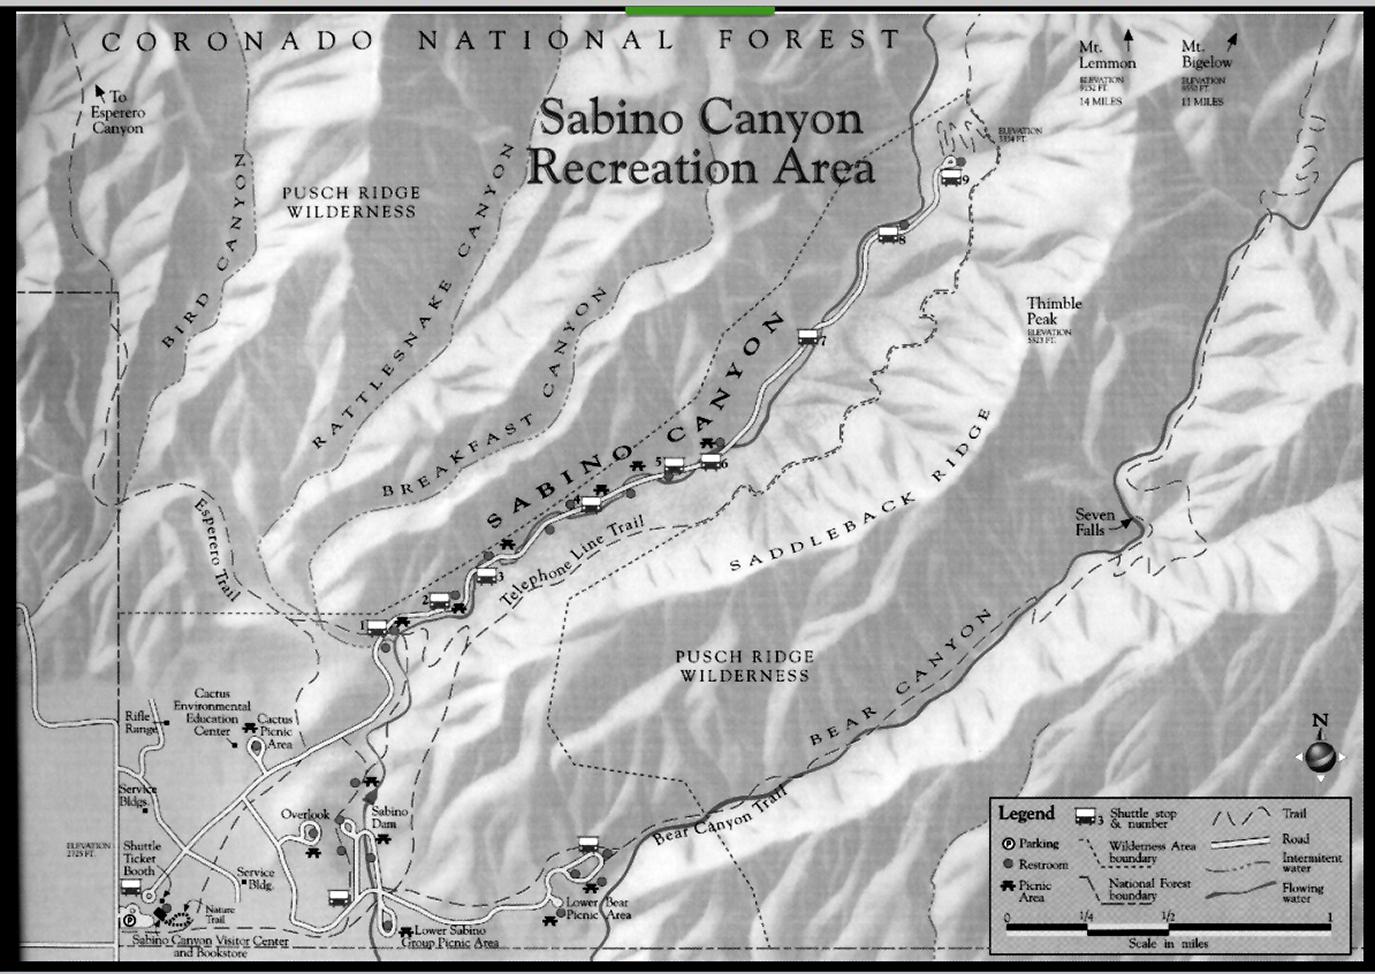 Tucson Arizona Karte.Karte Seven Falls Trail Tucson Arizona Debby Faya In